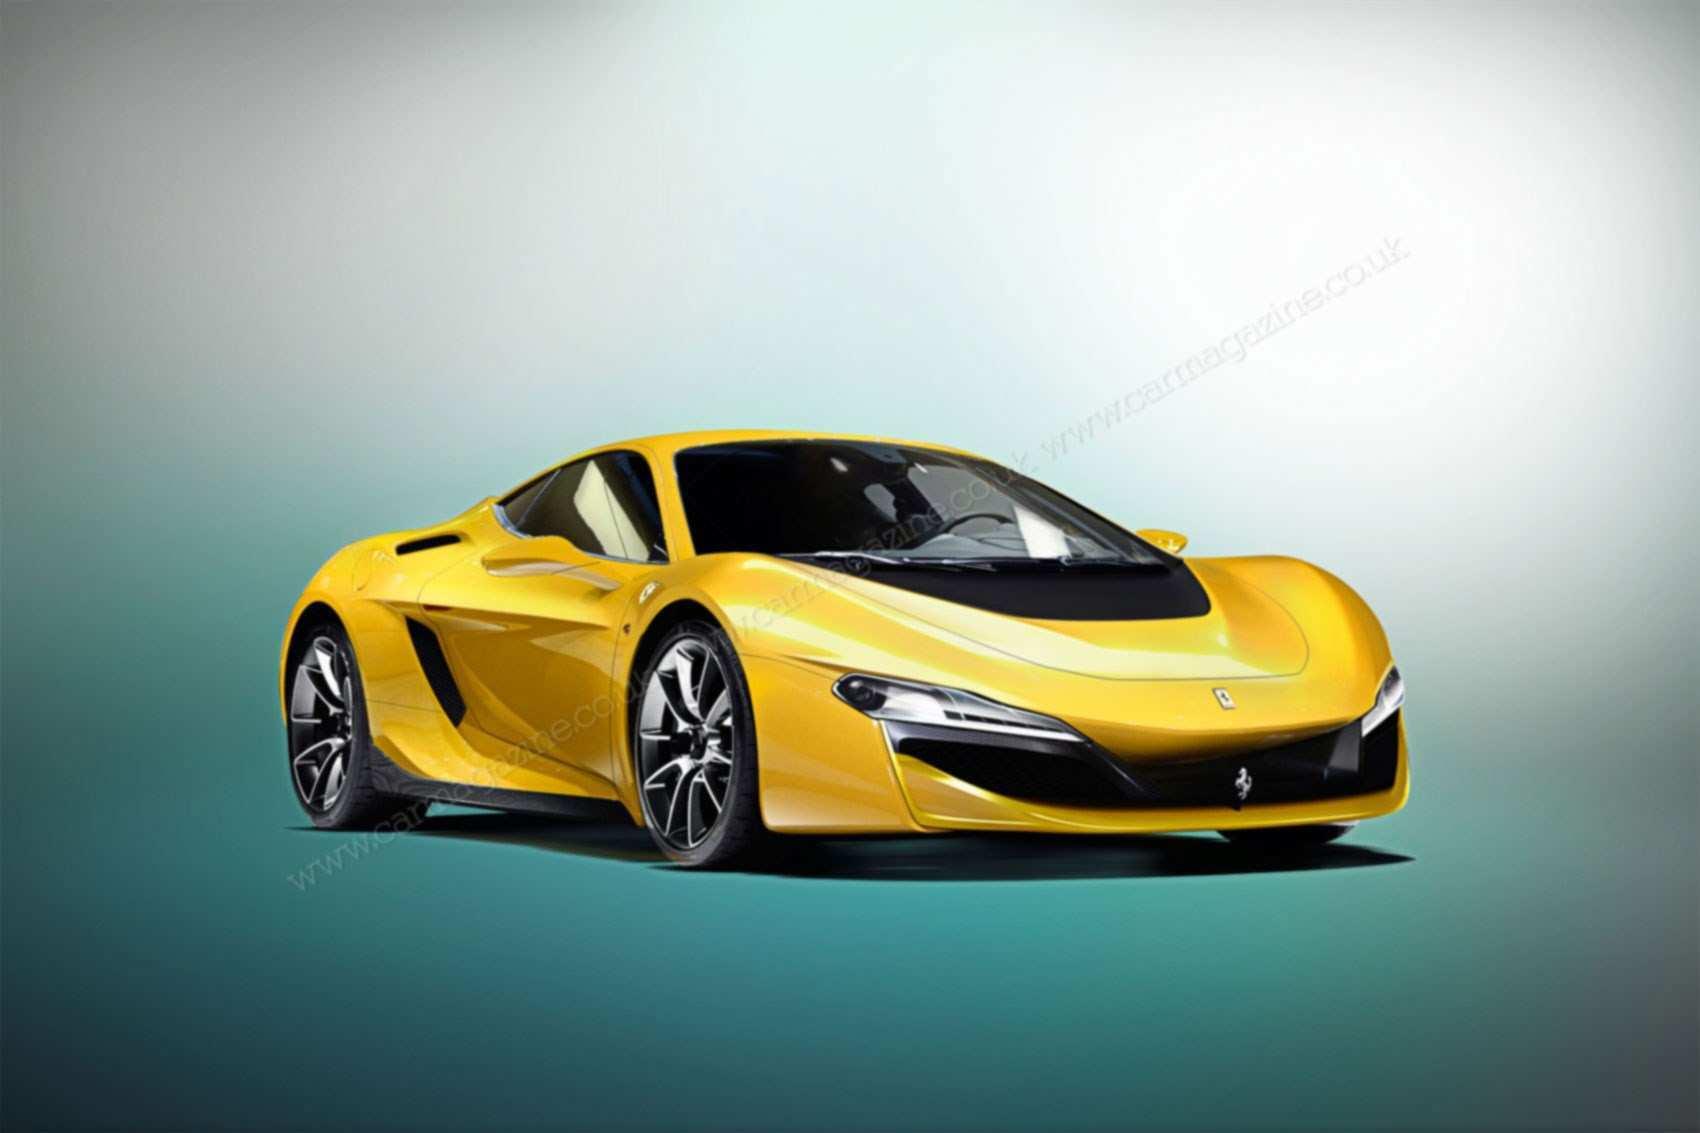 82 Best Review 2020 Ferrari Cars Exterior and Interior with 2020 Ferrari Cars